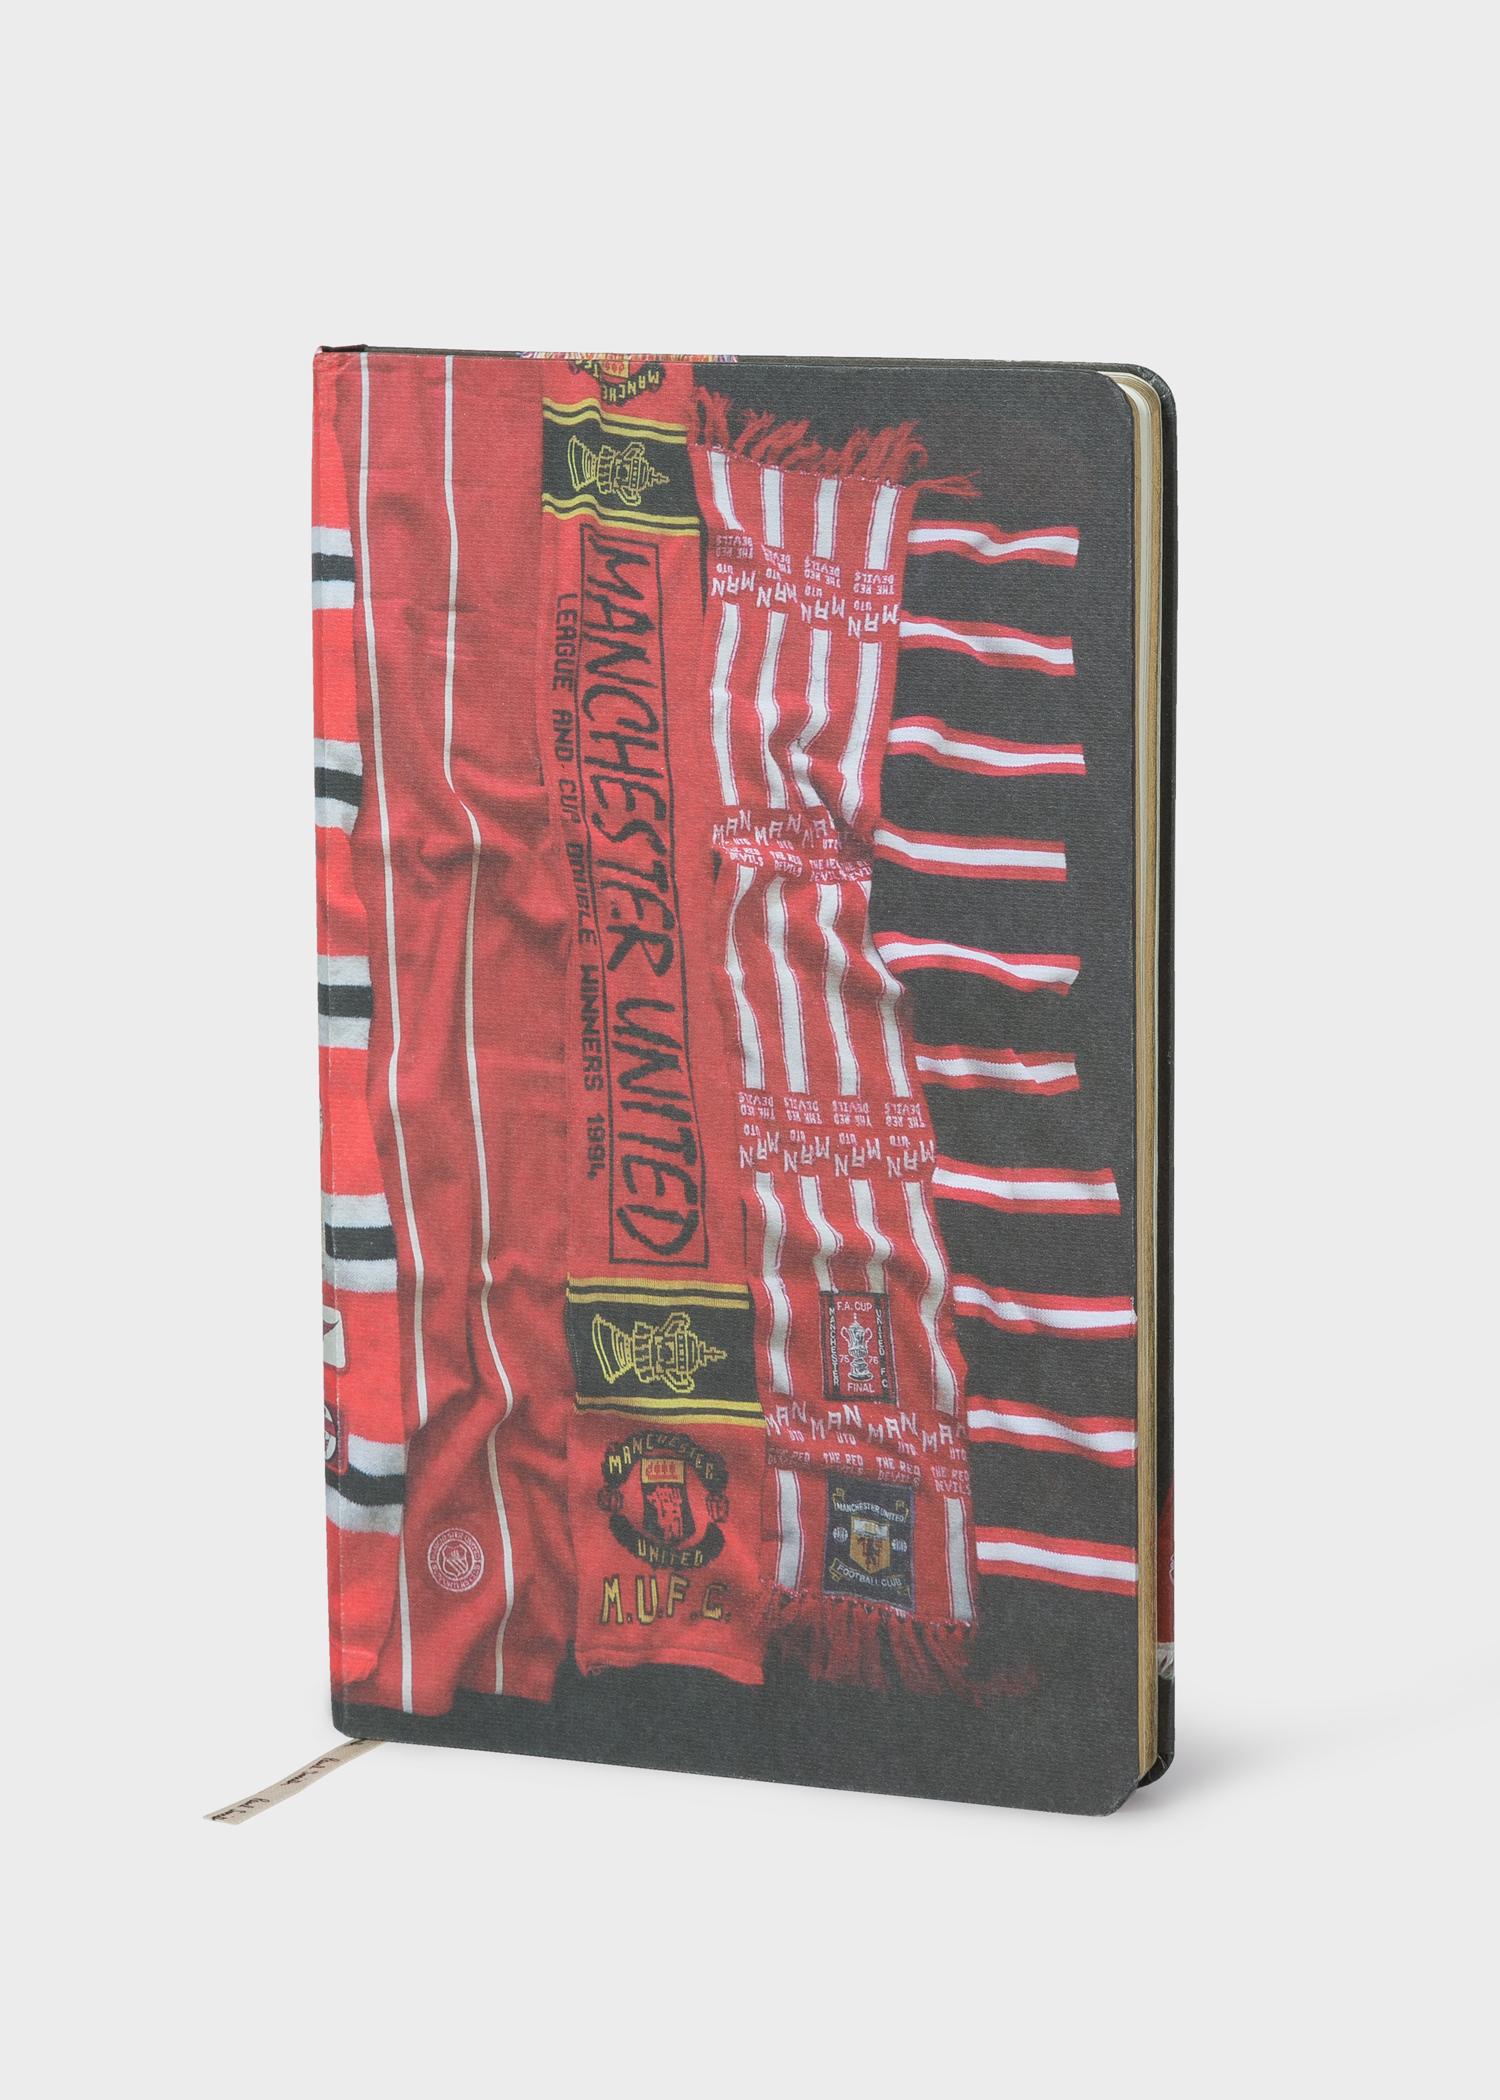 73af772b1d Paul Smith & Manchester United - 'Vintage Scarf' Print Notebook